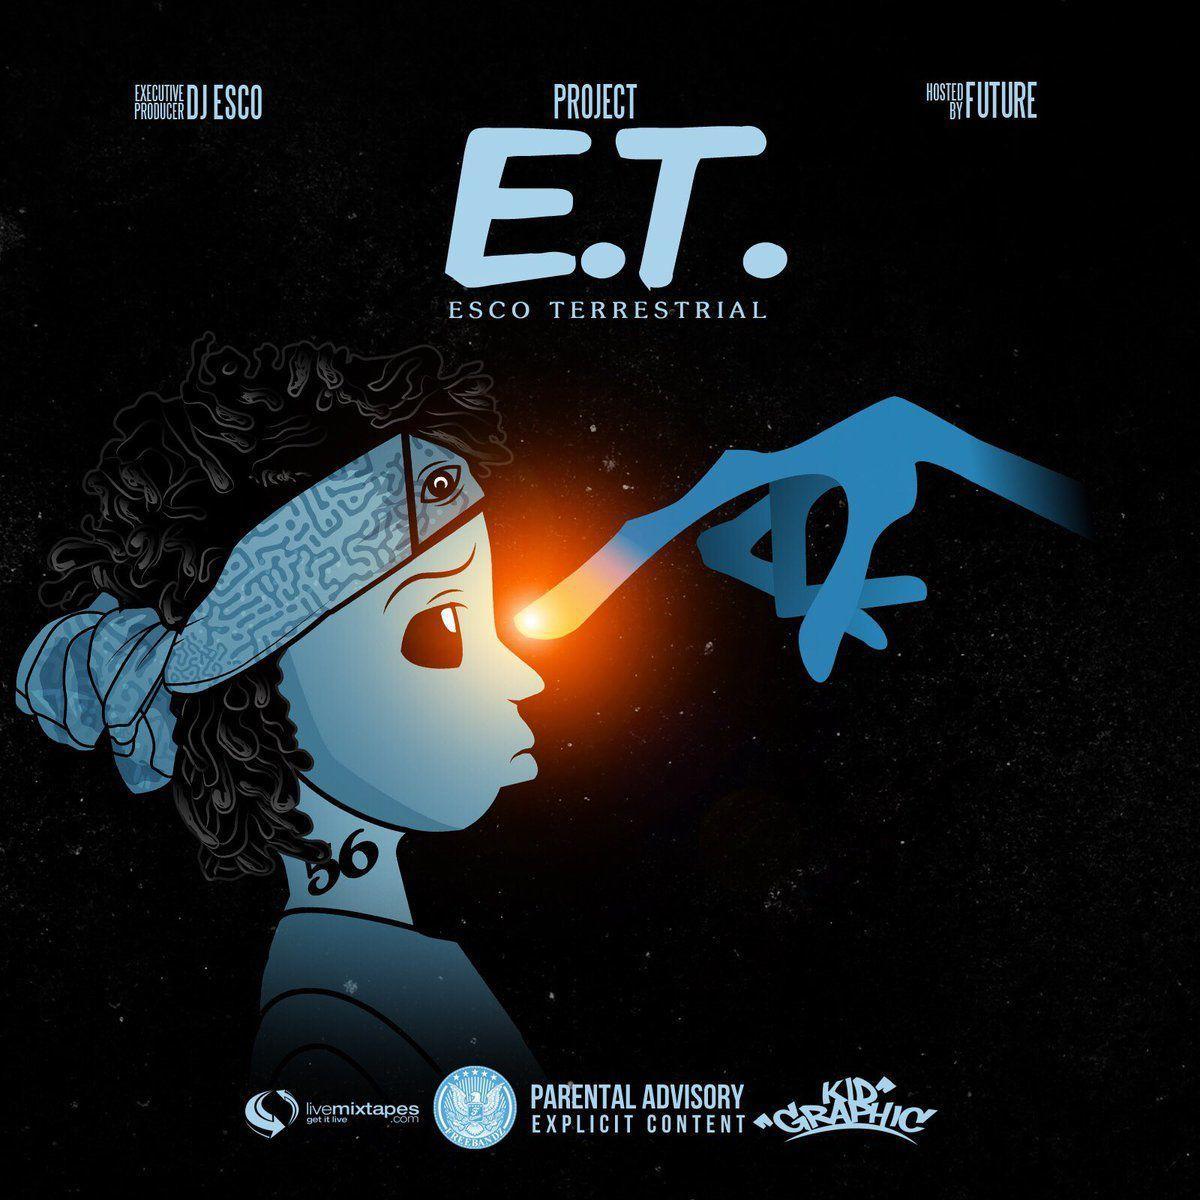 future-dj-esco-project-et-cover.jpg _lowres